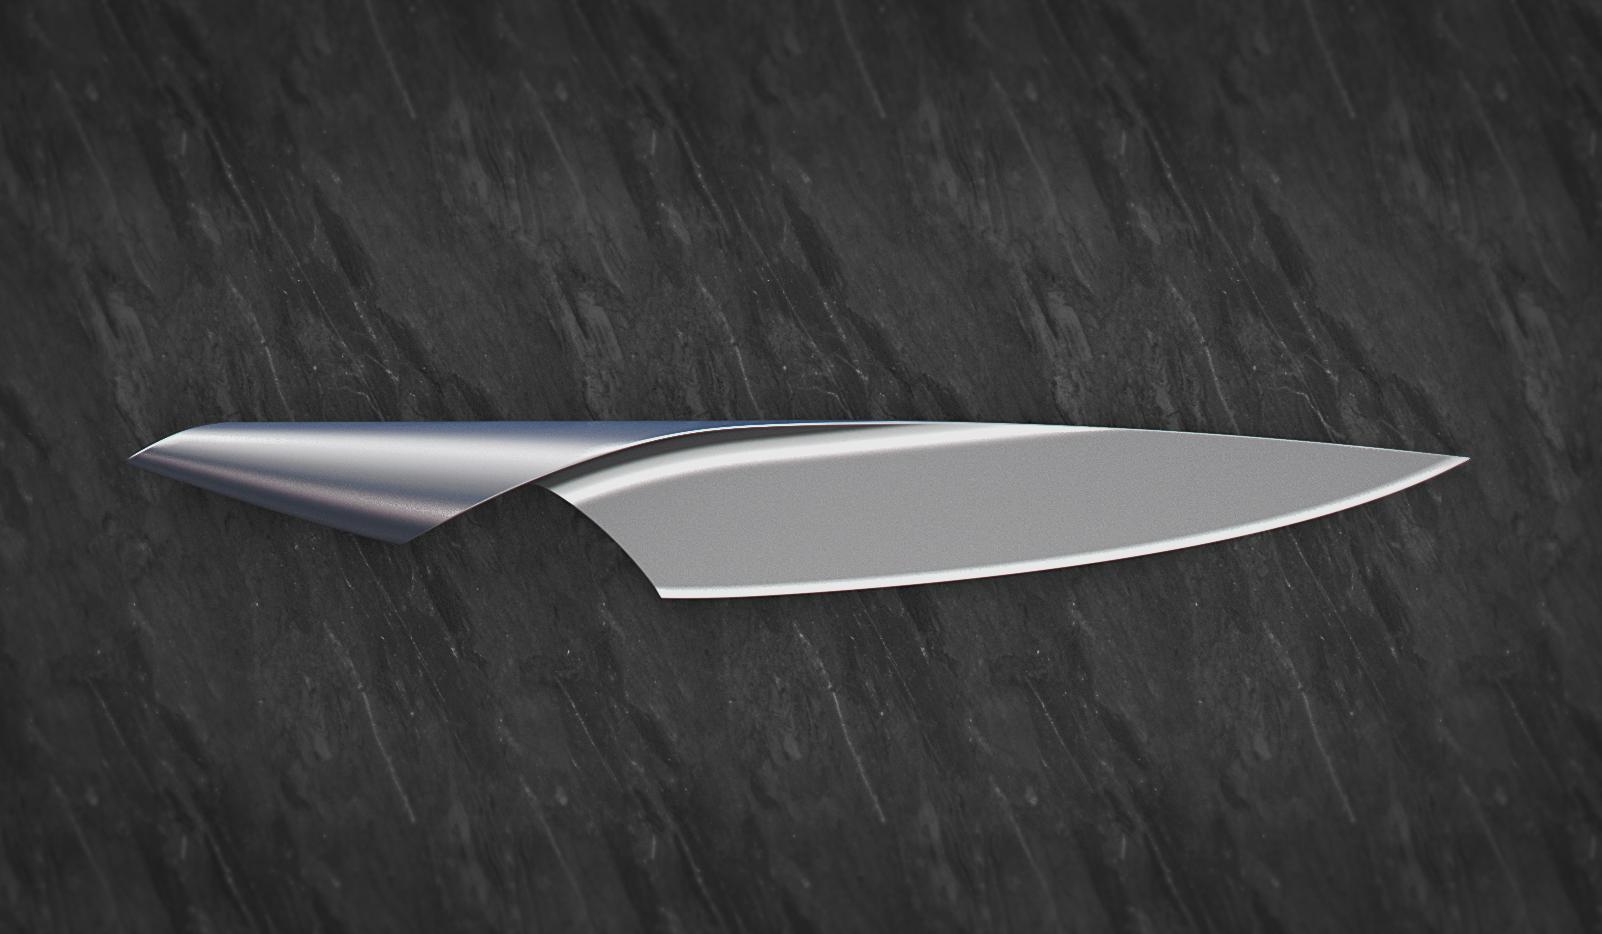 Saito Knife Cutlery Design Knife Design Industrial Design Sketch